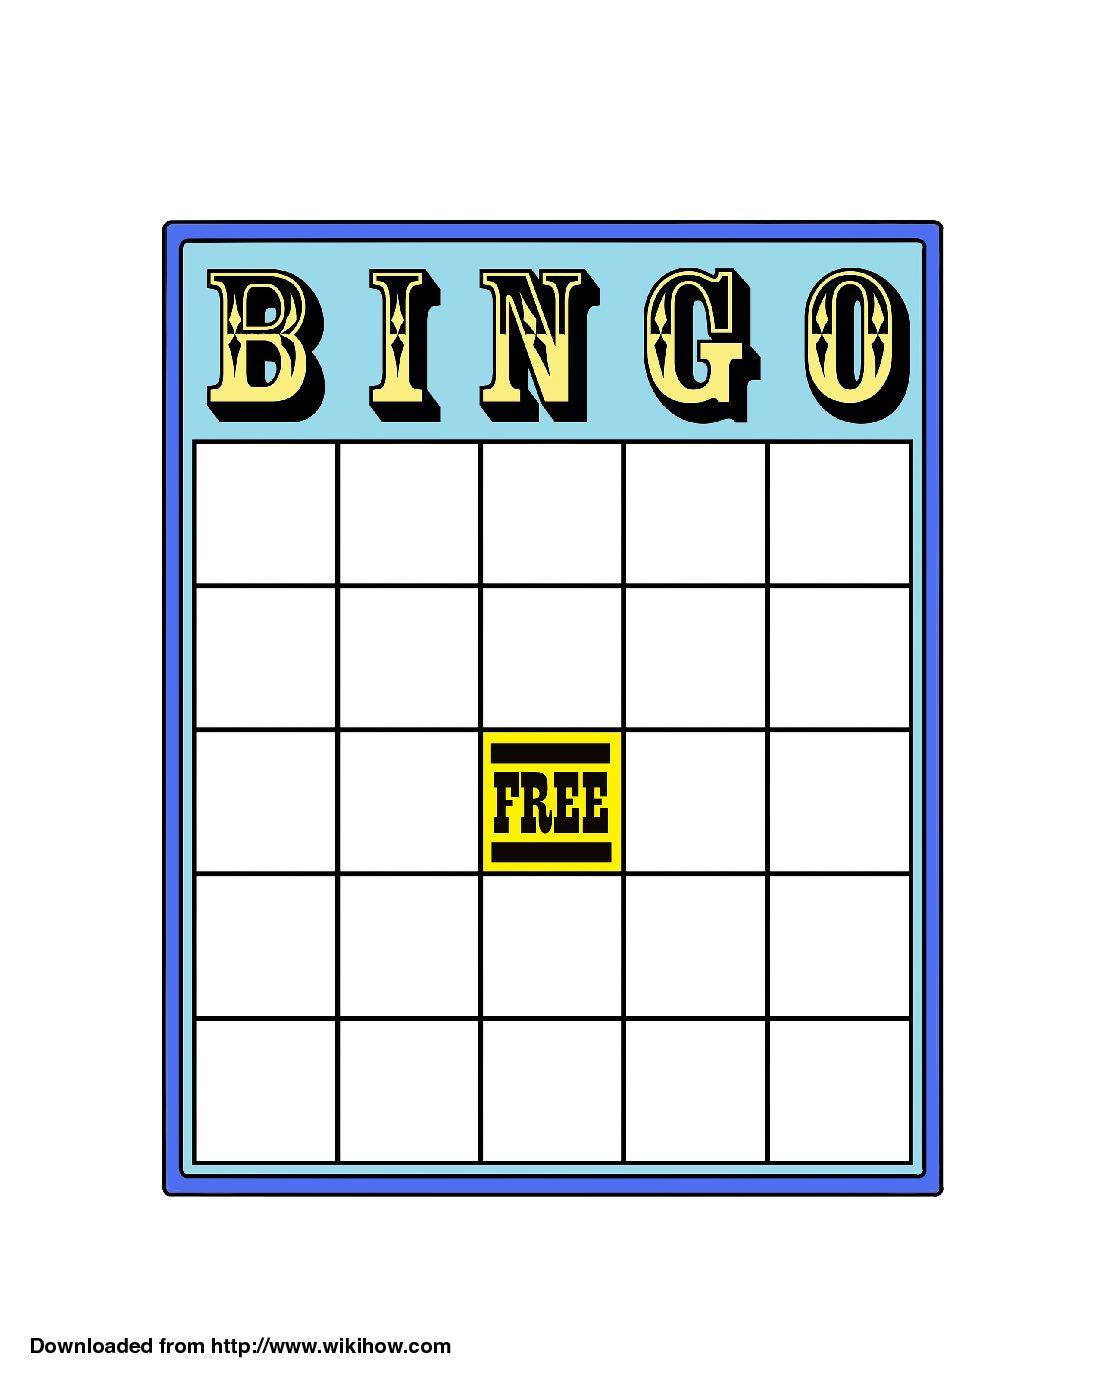 Plain Bingo Card Colona Rsd7 In Blank Bingo Card Template Microsoft Word Best Sample Template Business Card Template Word Bingo Template Blank Bingo Cards